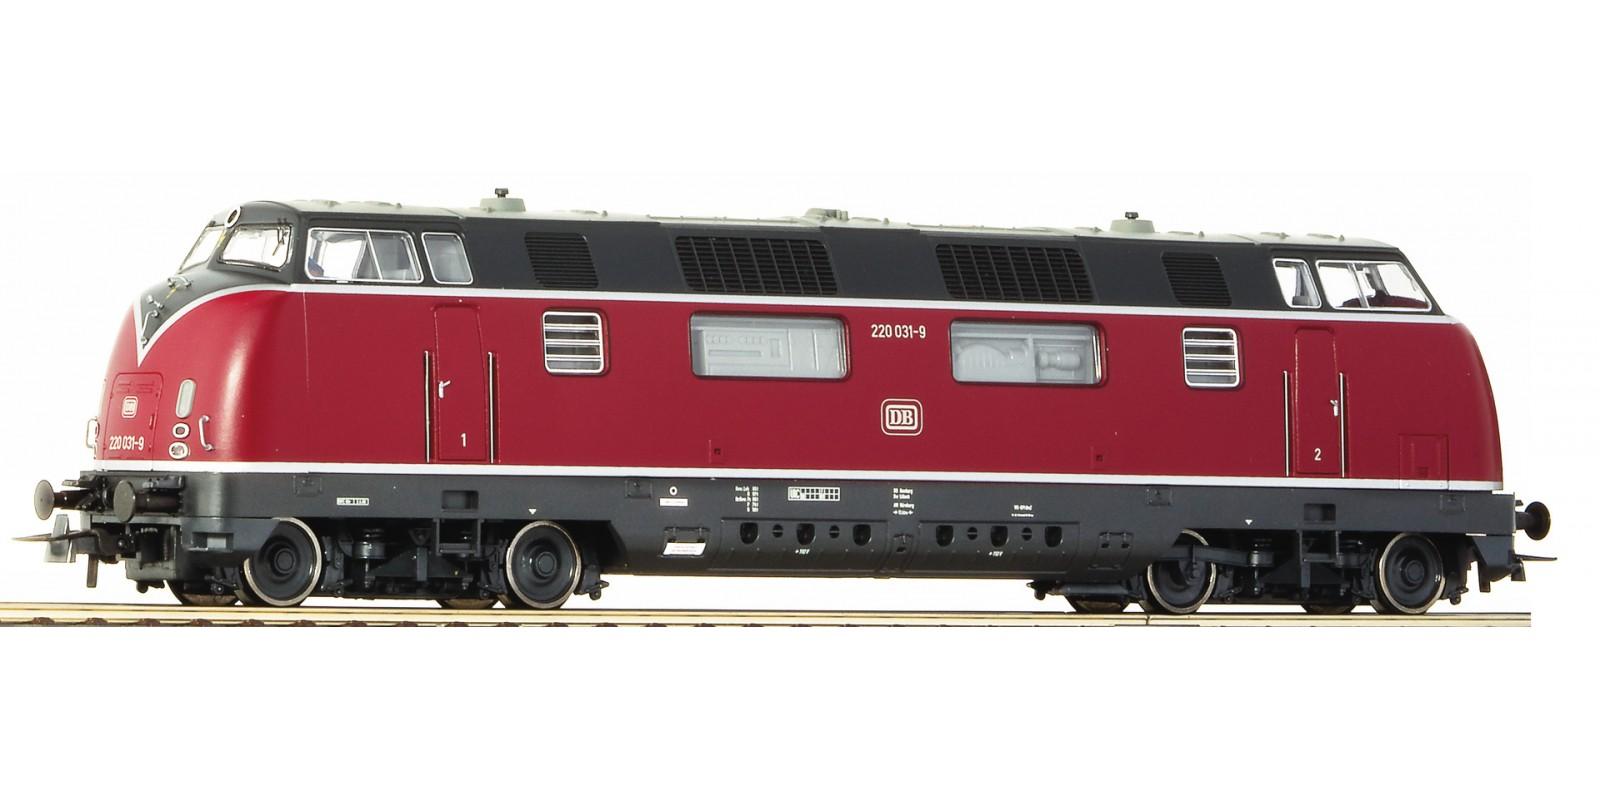 RO58680 - Diesel locomotive 220 036-8, DB